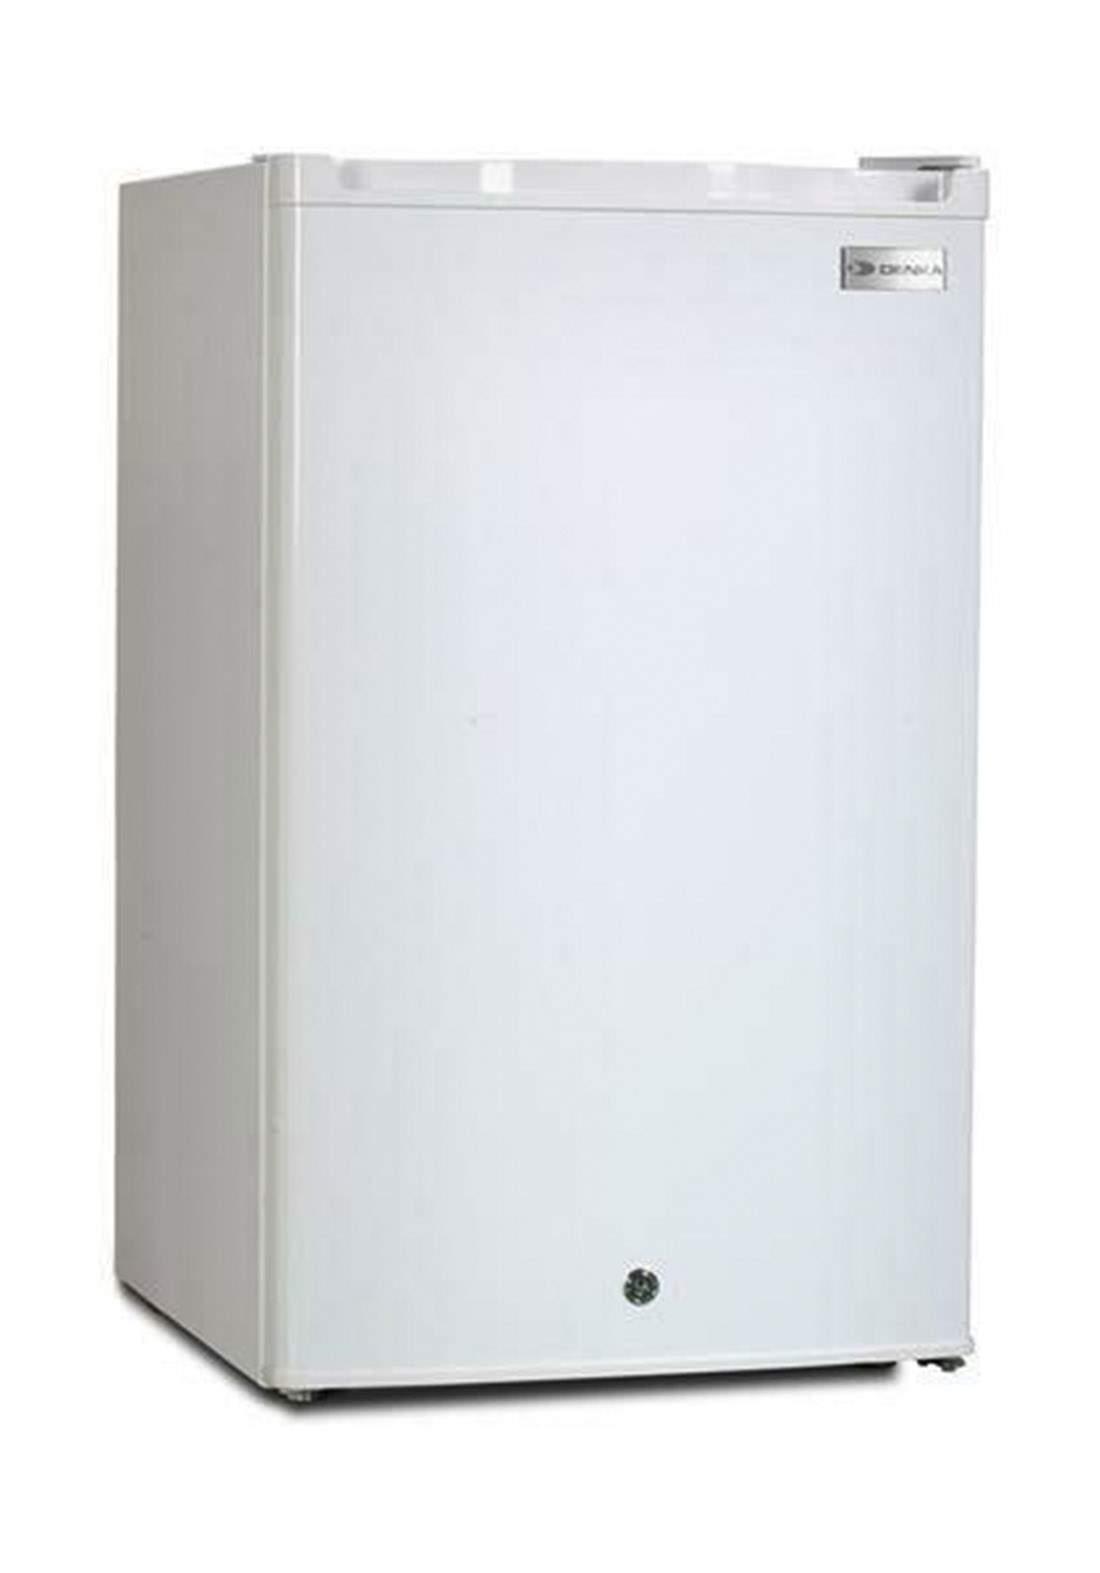 Denka GCF-130VWLT  Upright Freezer 130L Direct Cool مجمدة عمودية